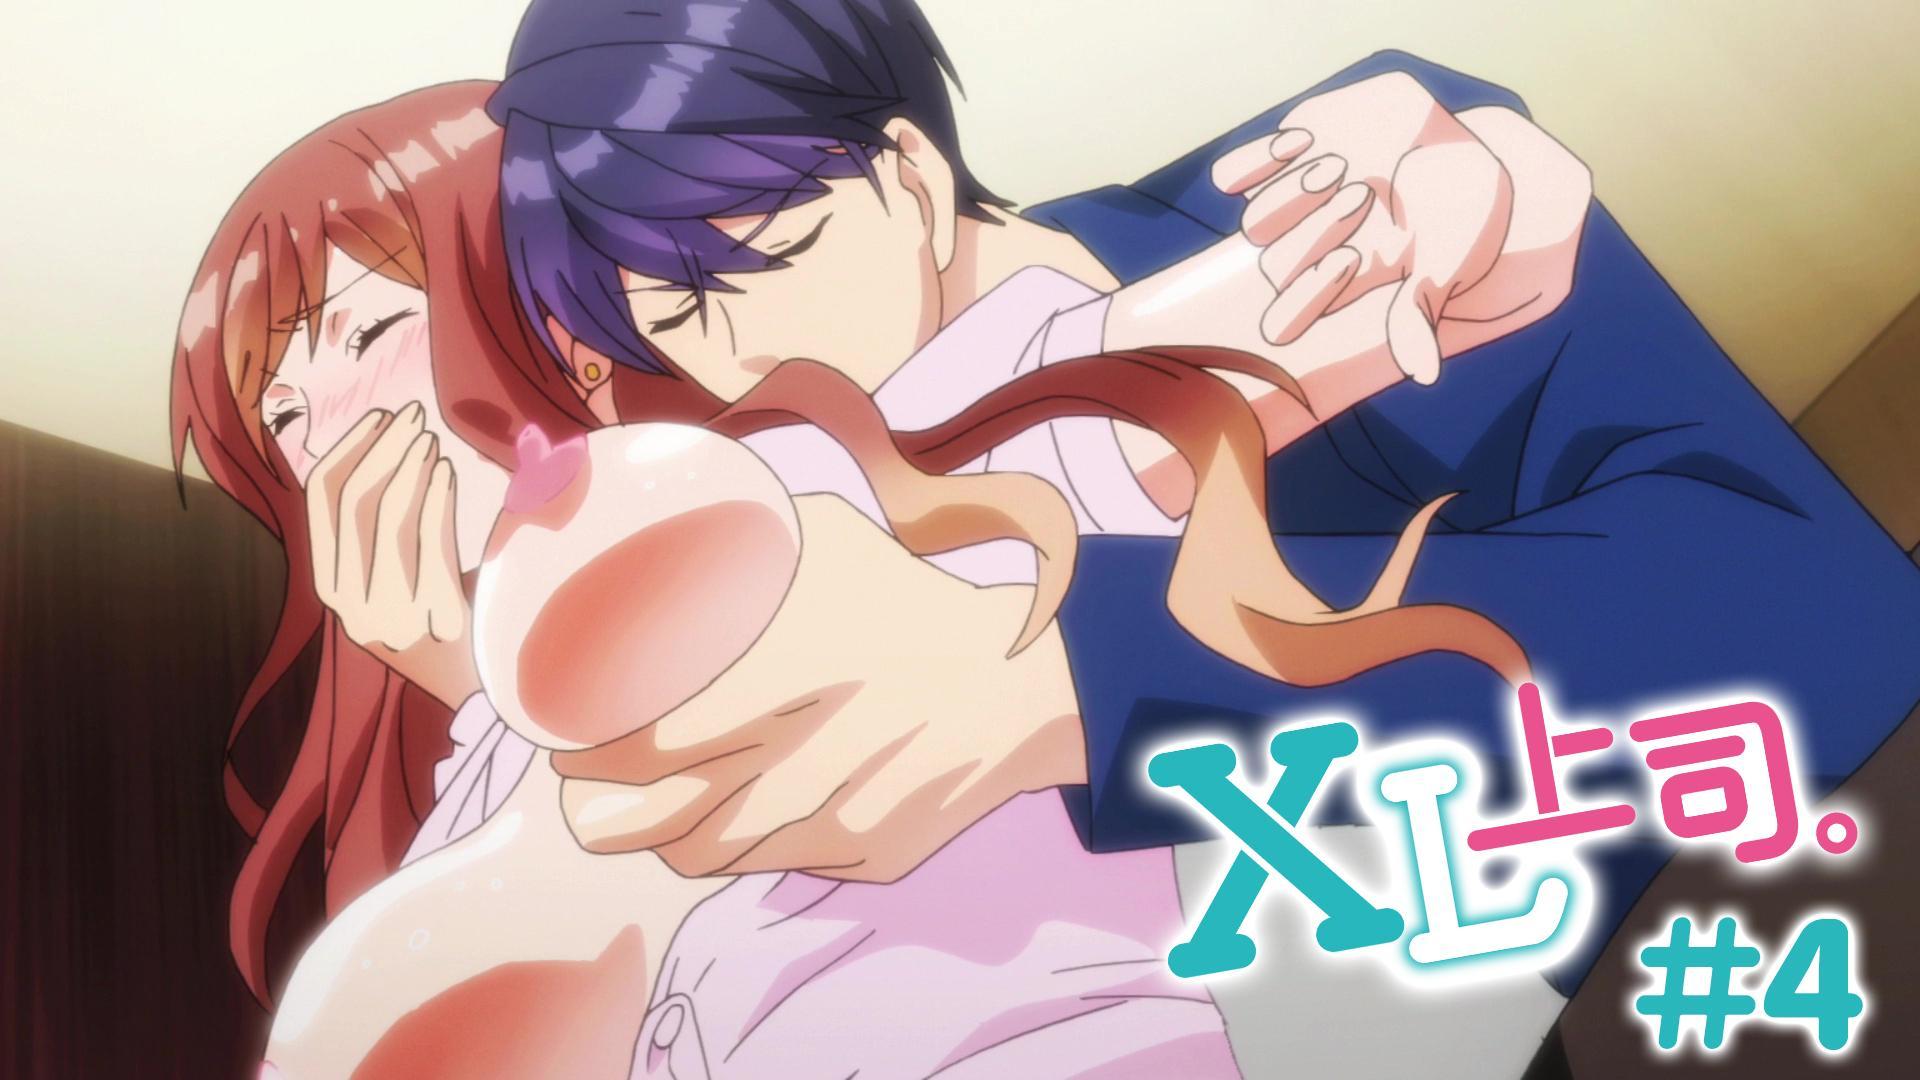 XL上司。【プレミアム版】【R18版】 #4 「他の男が…お前に触れるのは嫌だ。」